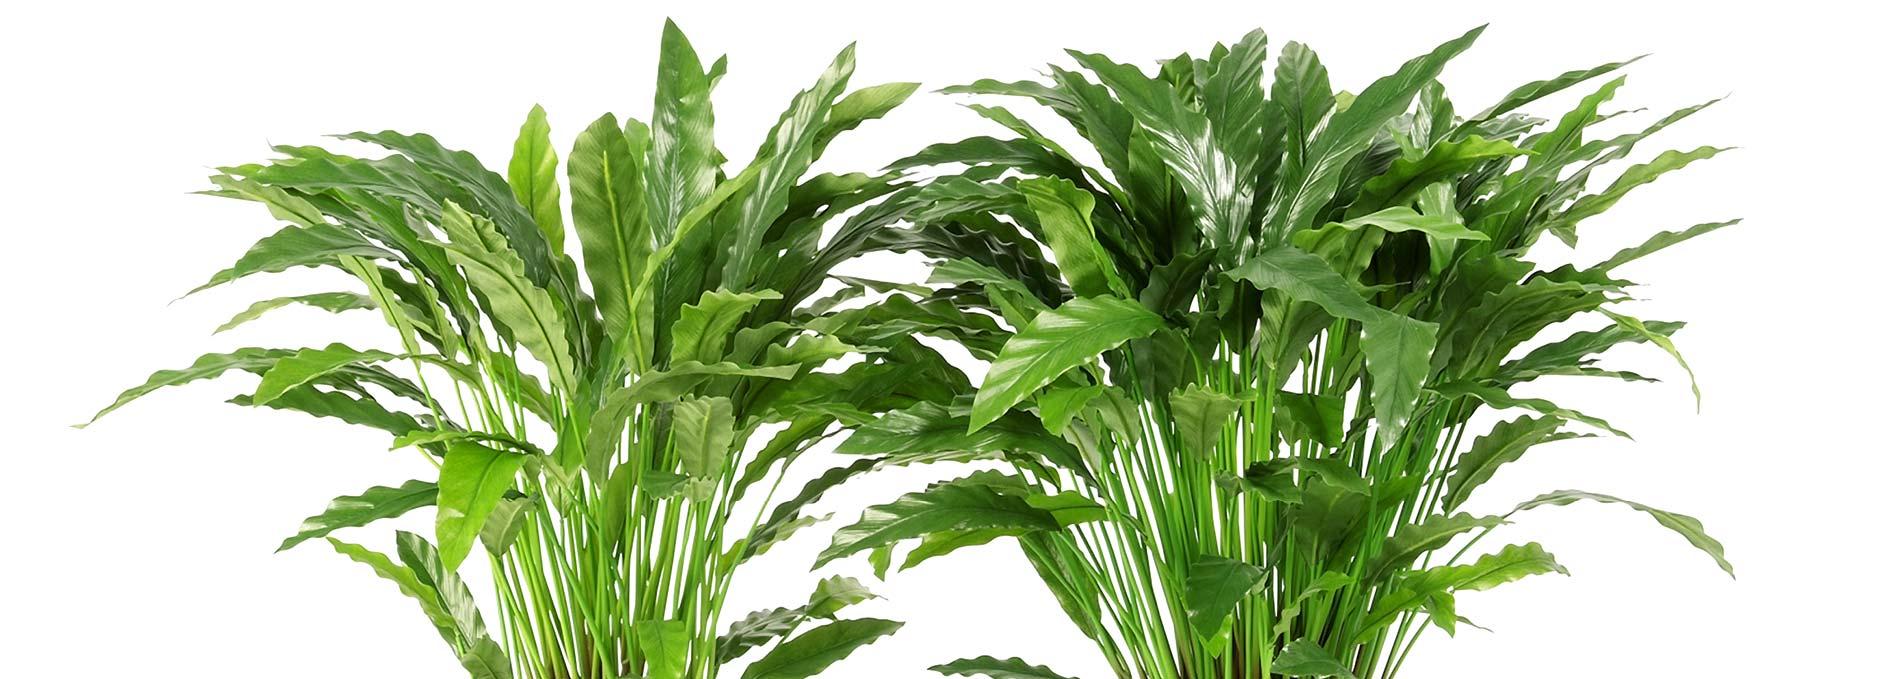 Darden-Importacao_Producao_Comercializacao-de-Plantas-e-Arvores-Artificiais_Banner-2